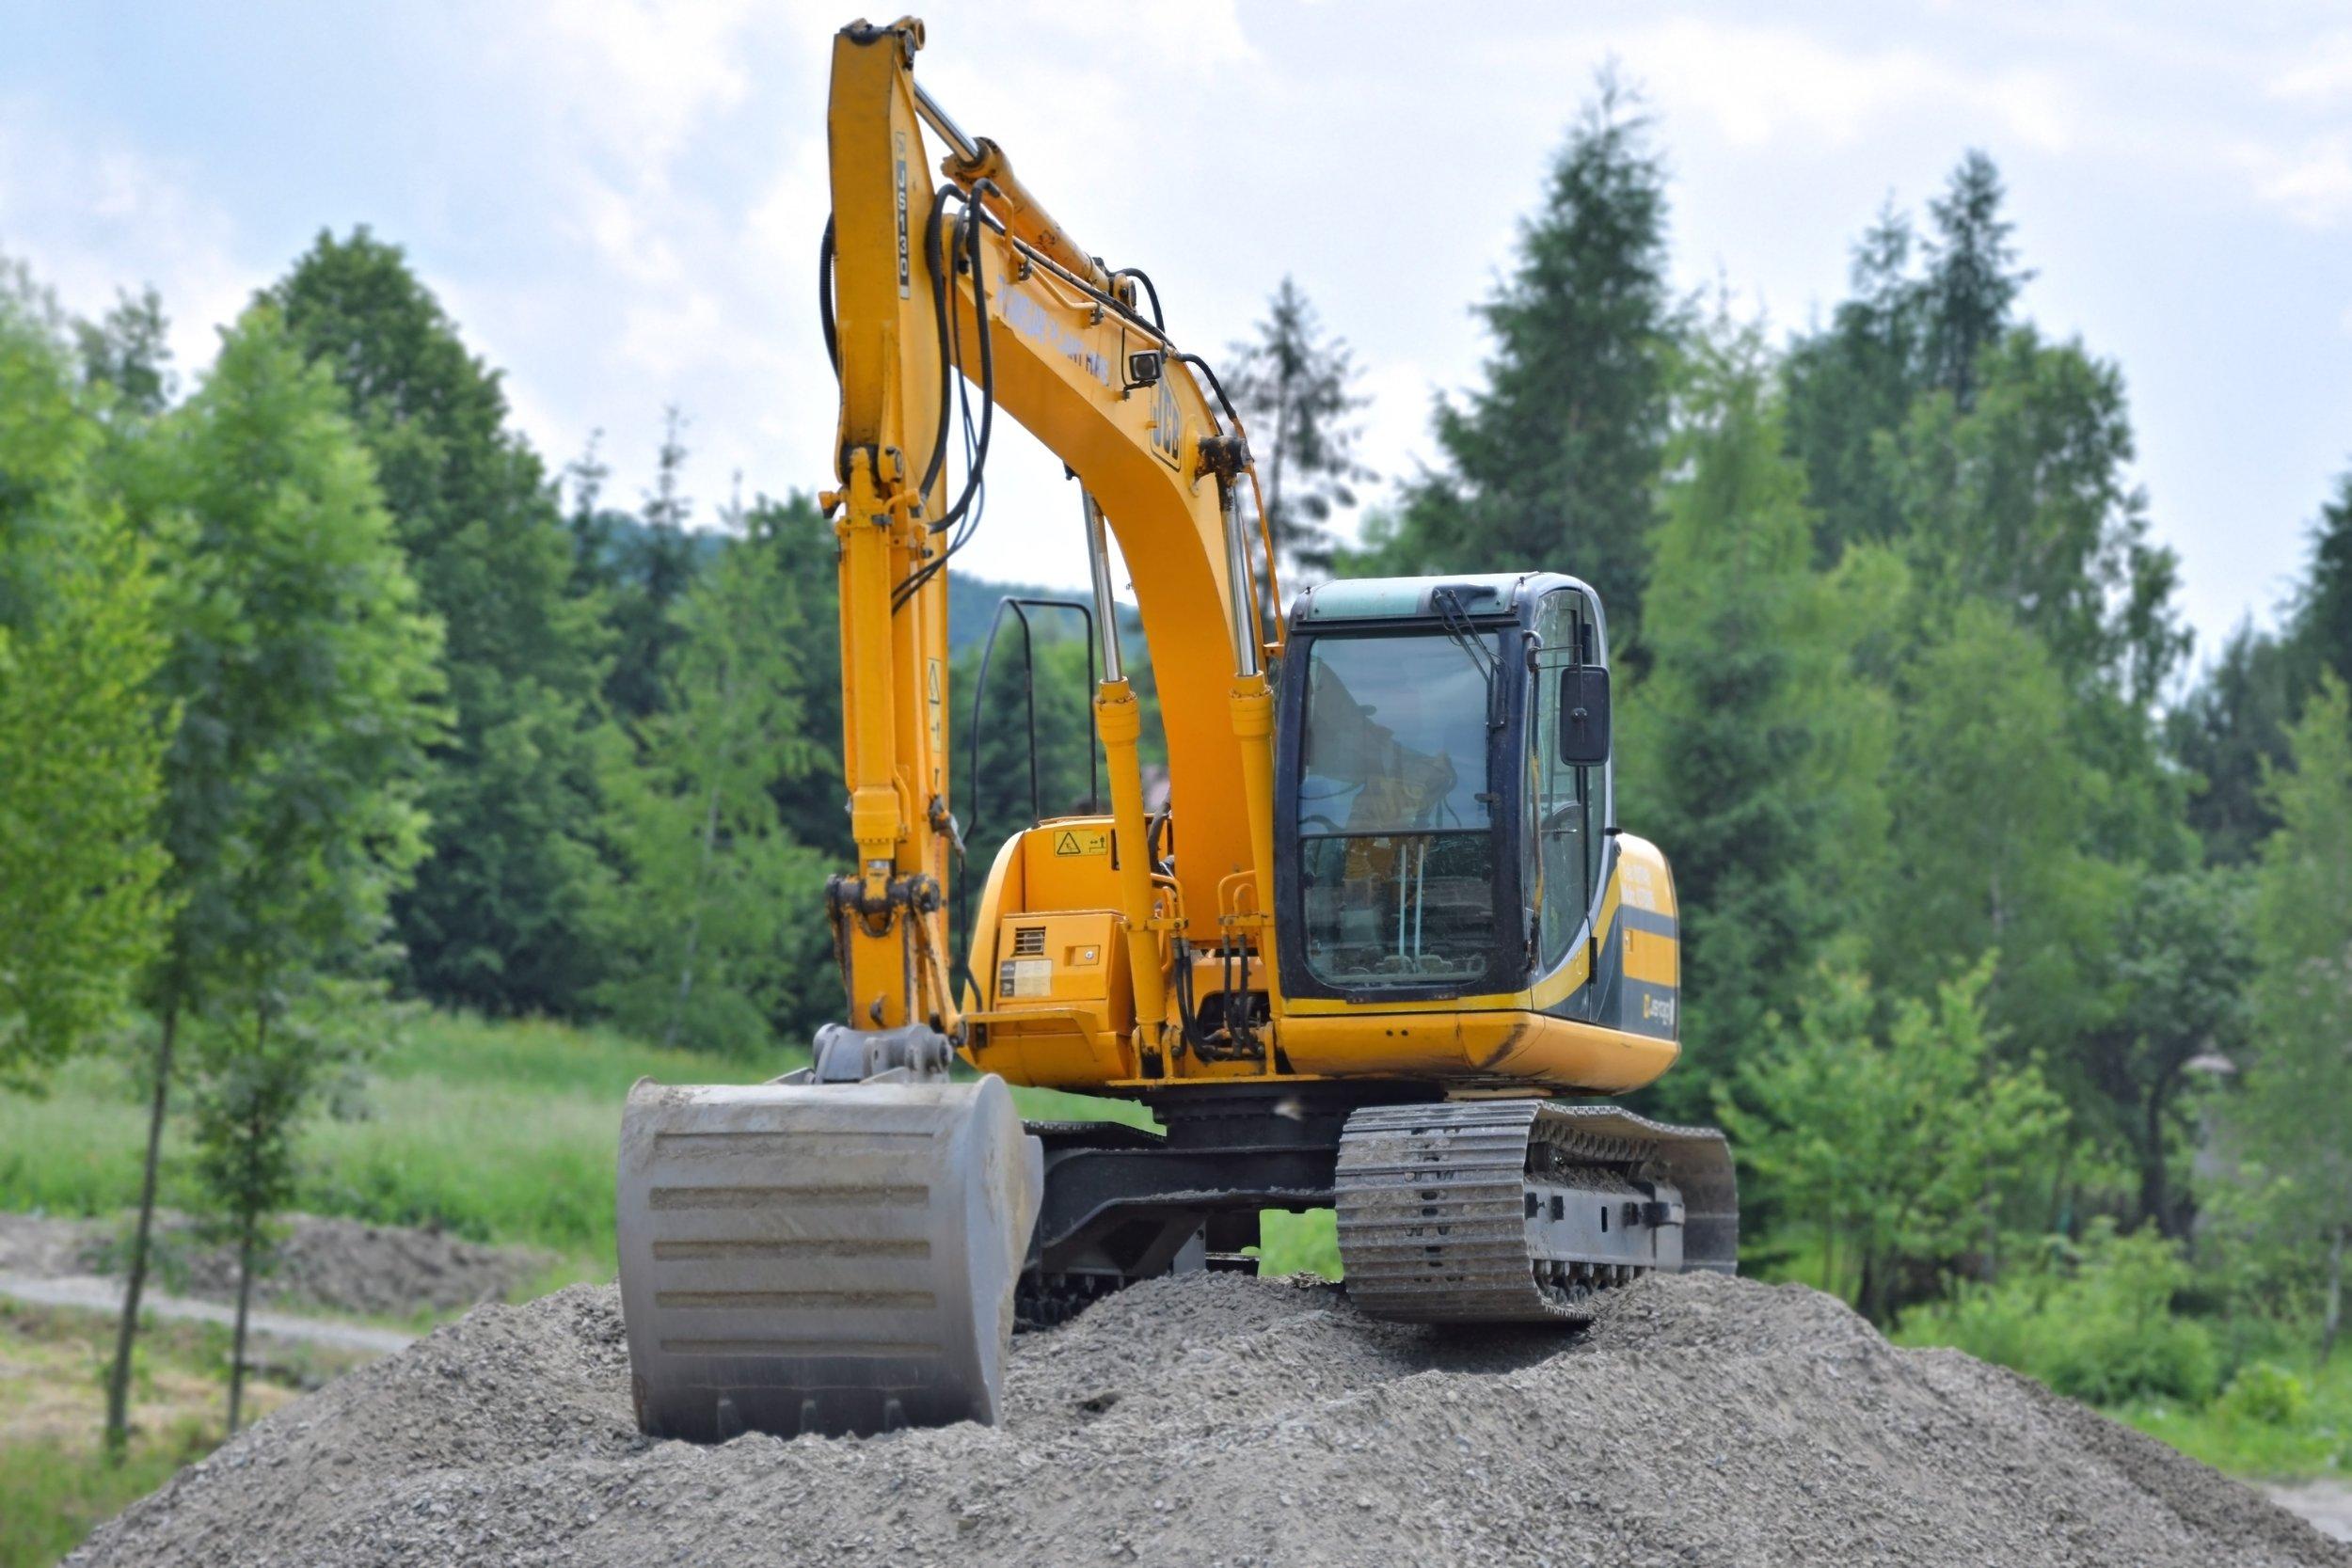 construction-excavator-gravel-95687.jpg